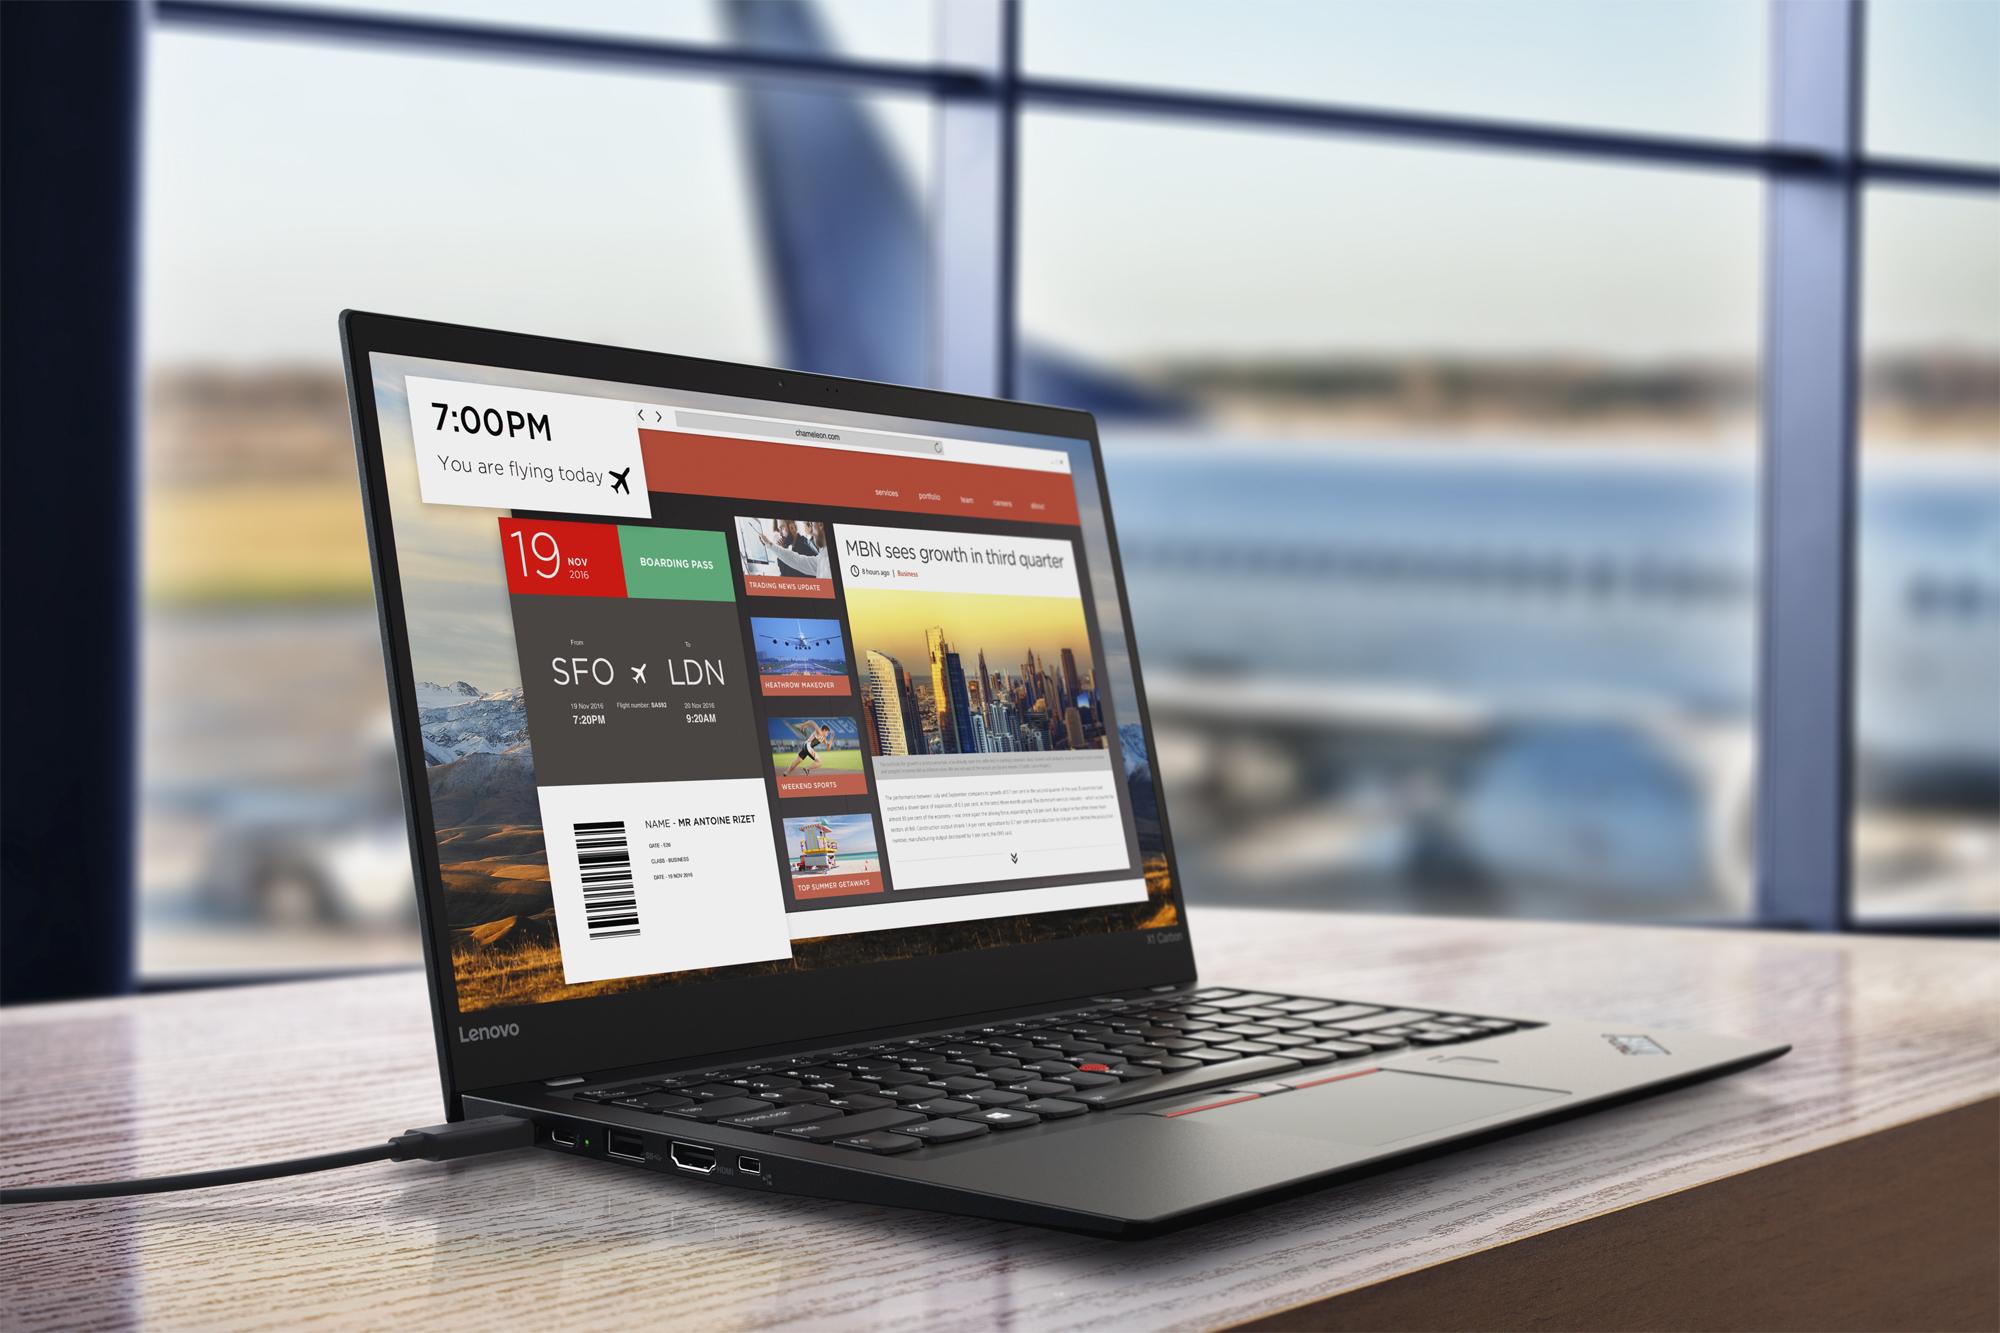 Lenovo ThinkPad X1 Carbon press image courtesy of Lenovo